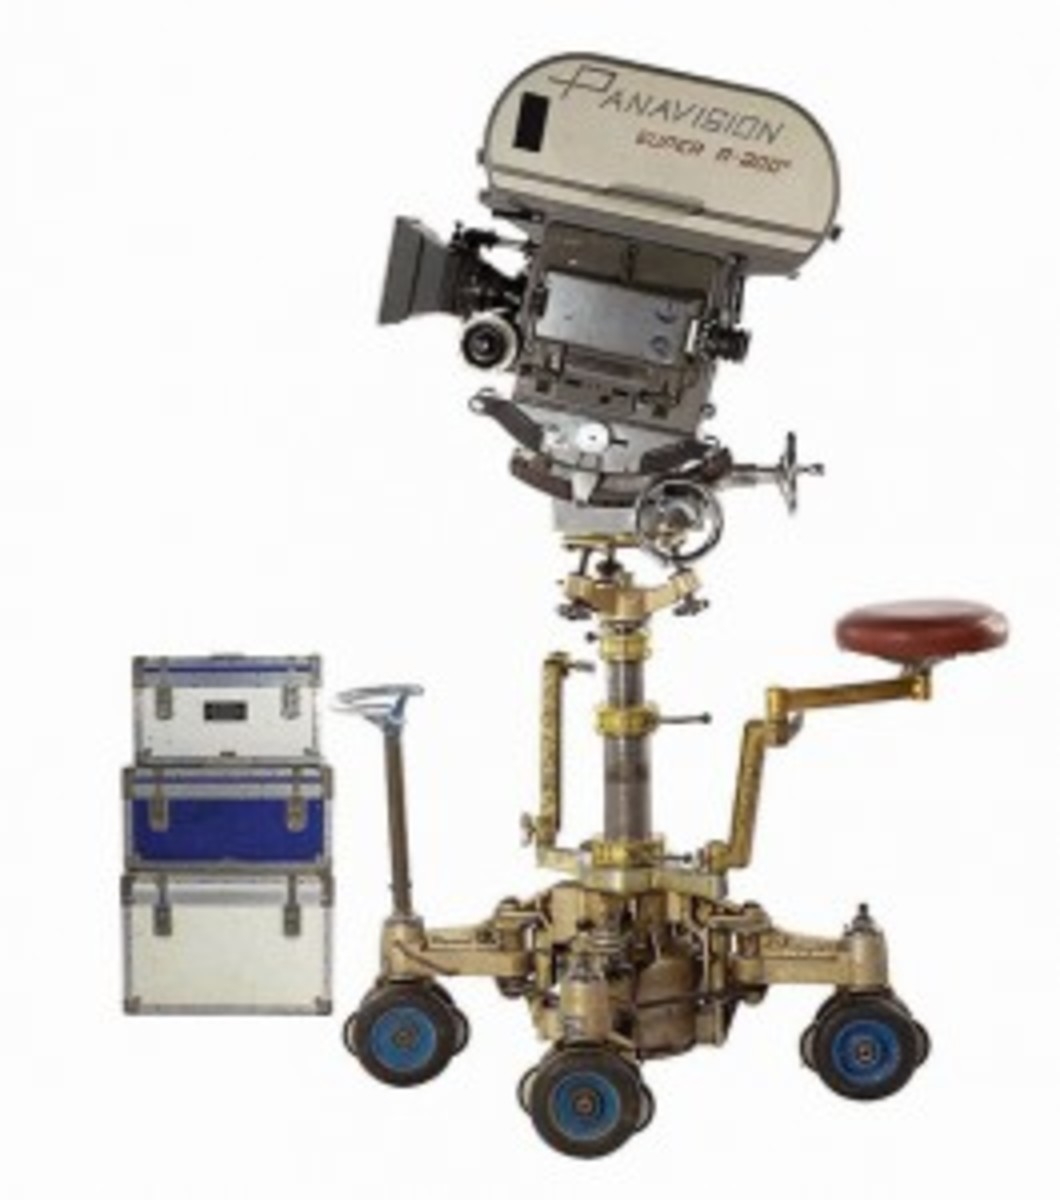 Exorcist film equipment